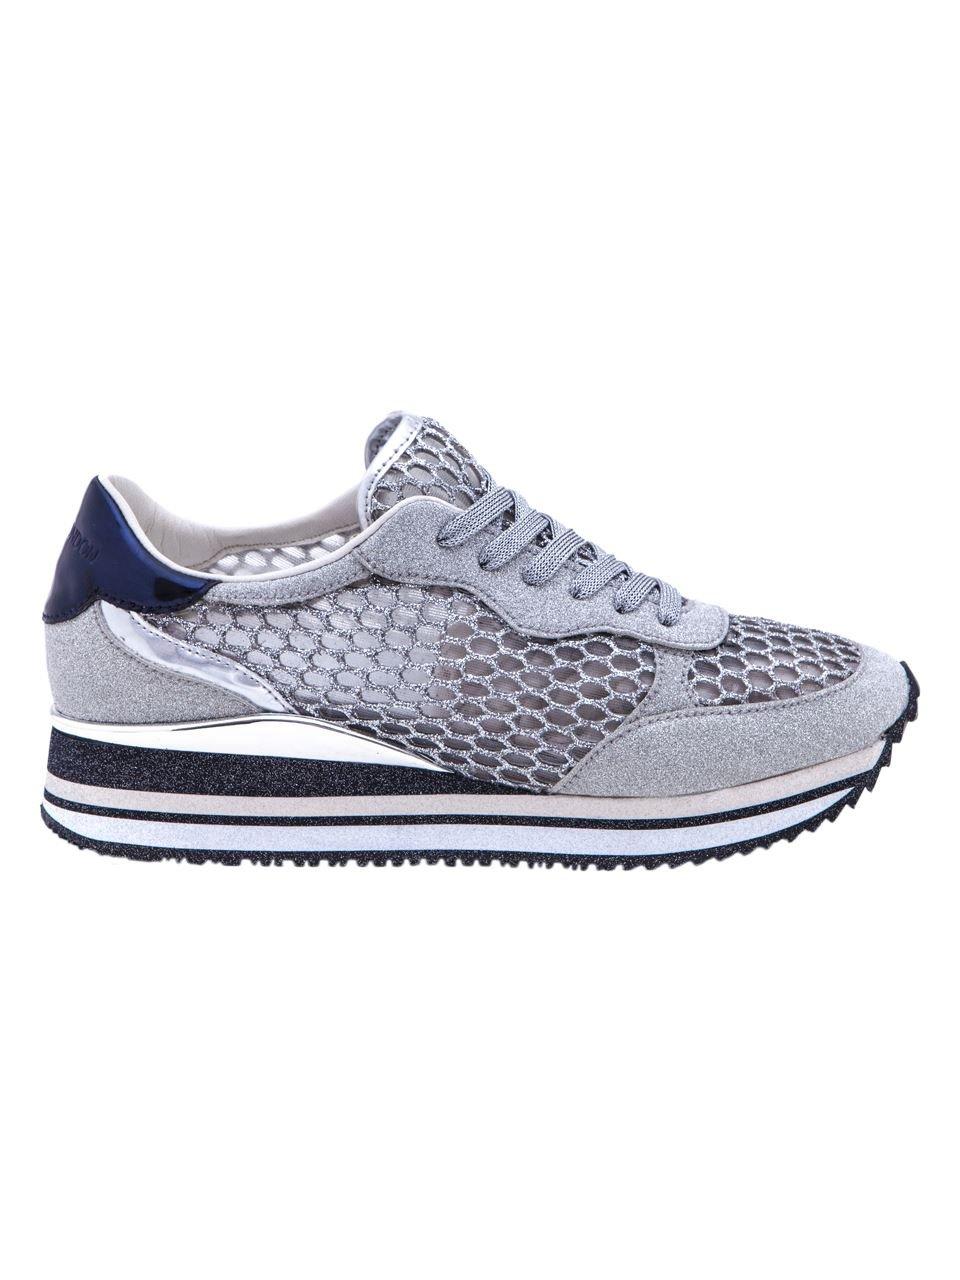 Crime - Zapatillas de Algodón para Mujer * 40 EU|Plateado